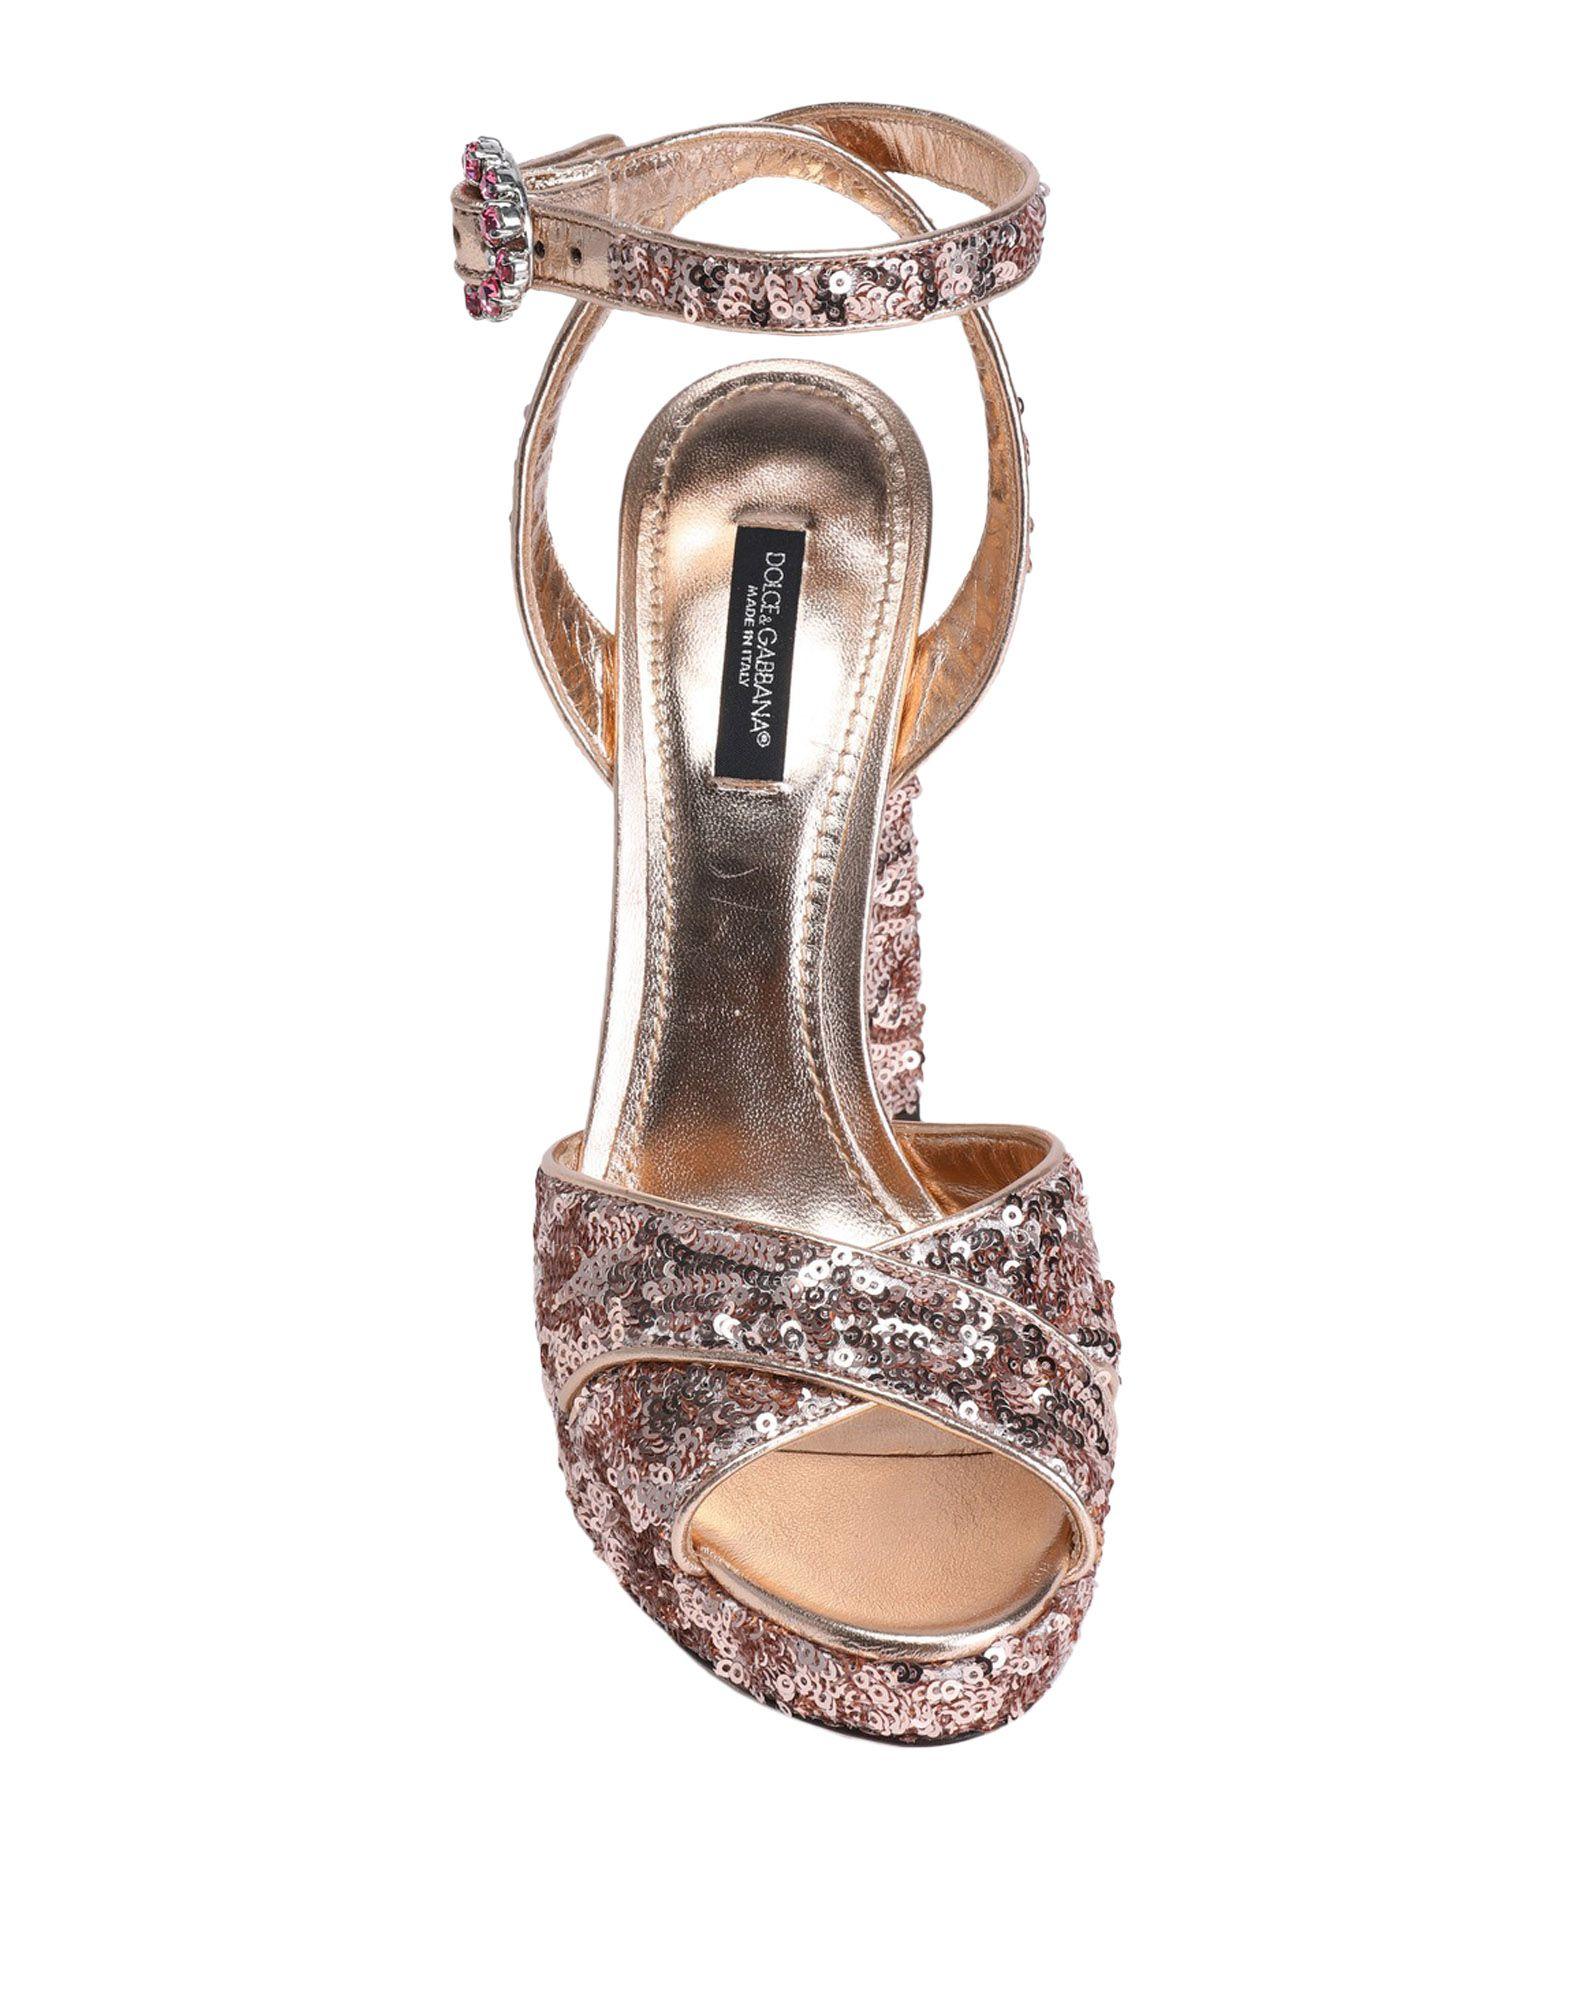 Dolce & Gabbana gut Sandalen Damen  11463420SJGünstige gut Gabbana aussehende Schuhe dd13db